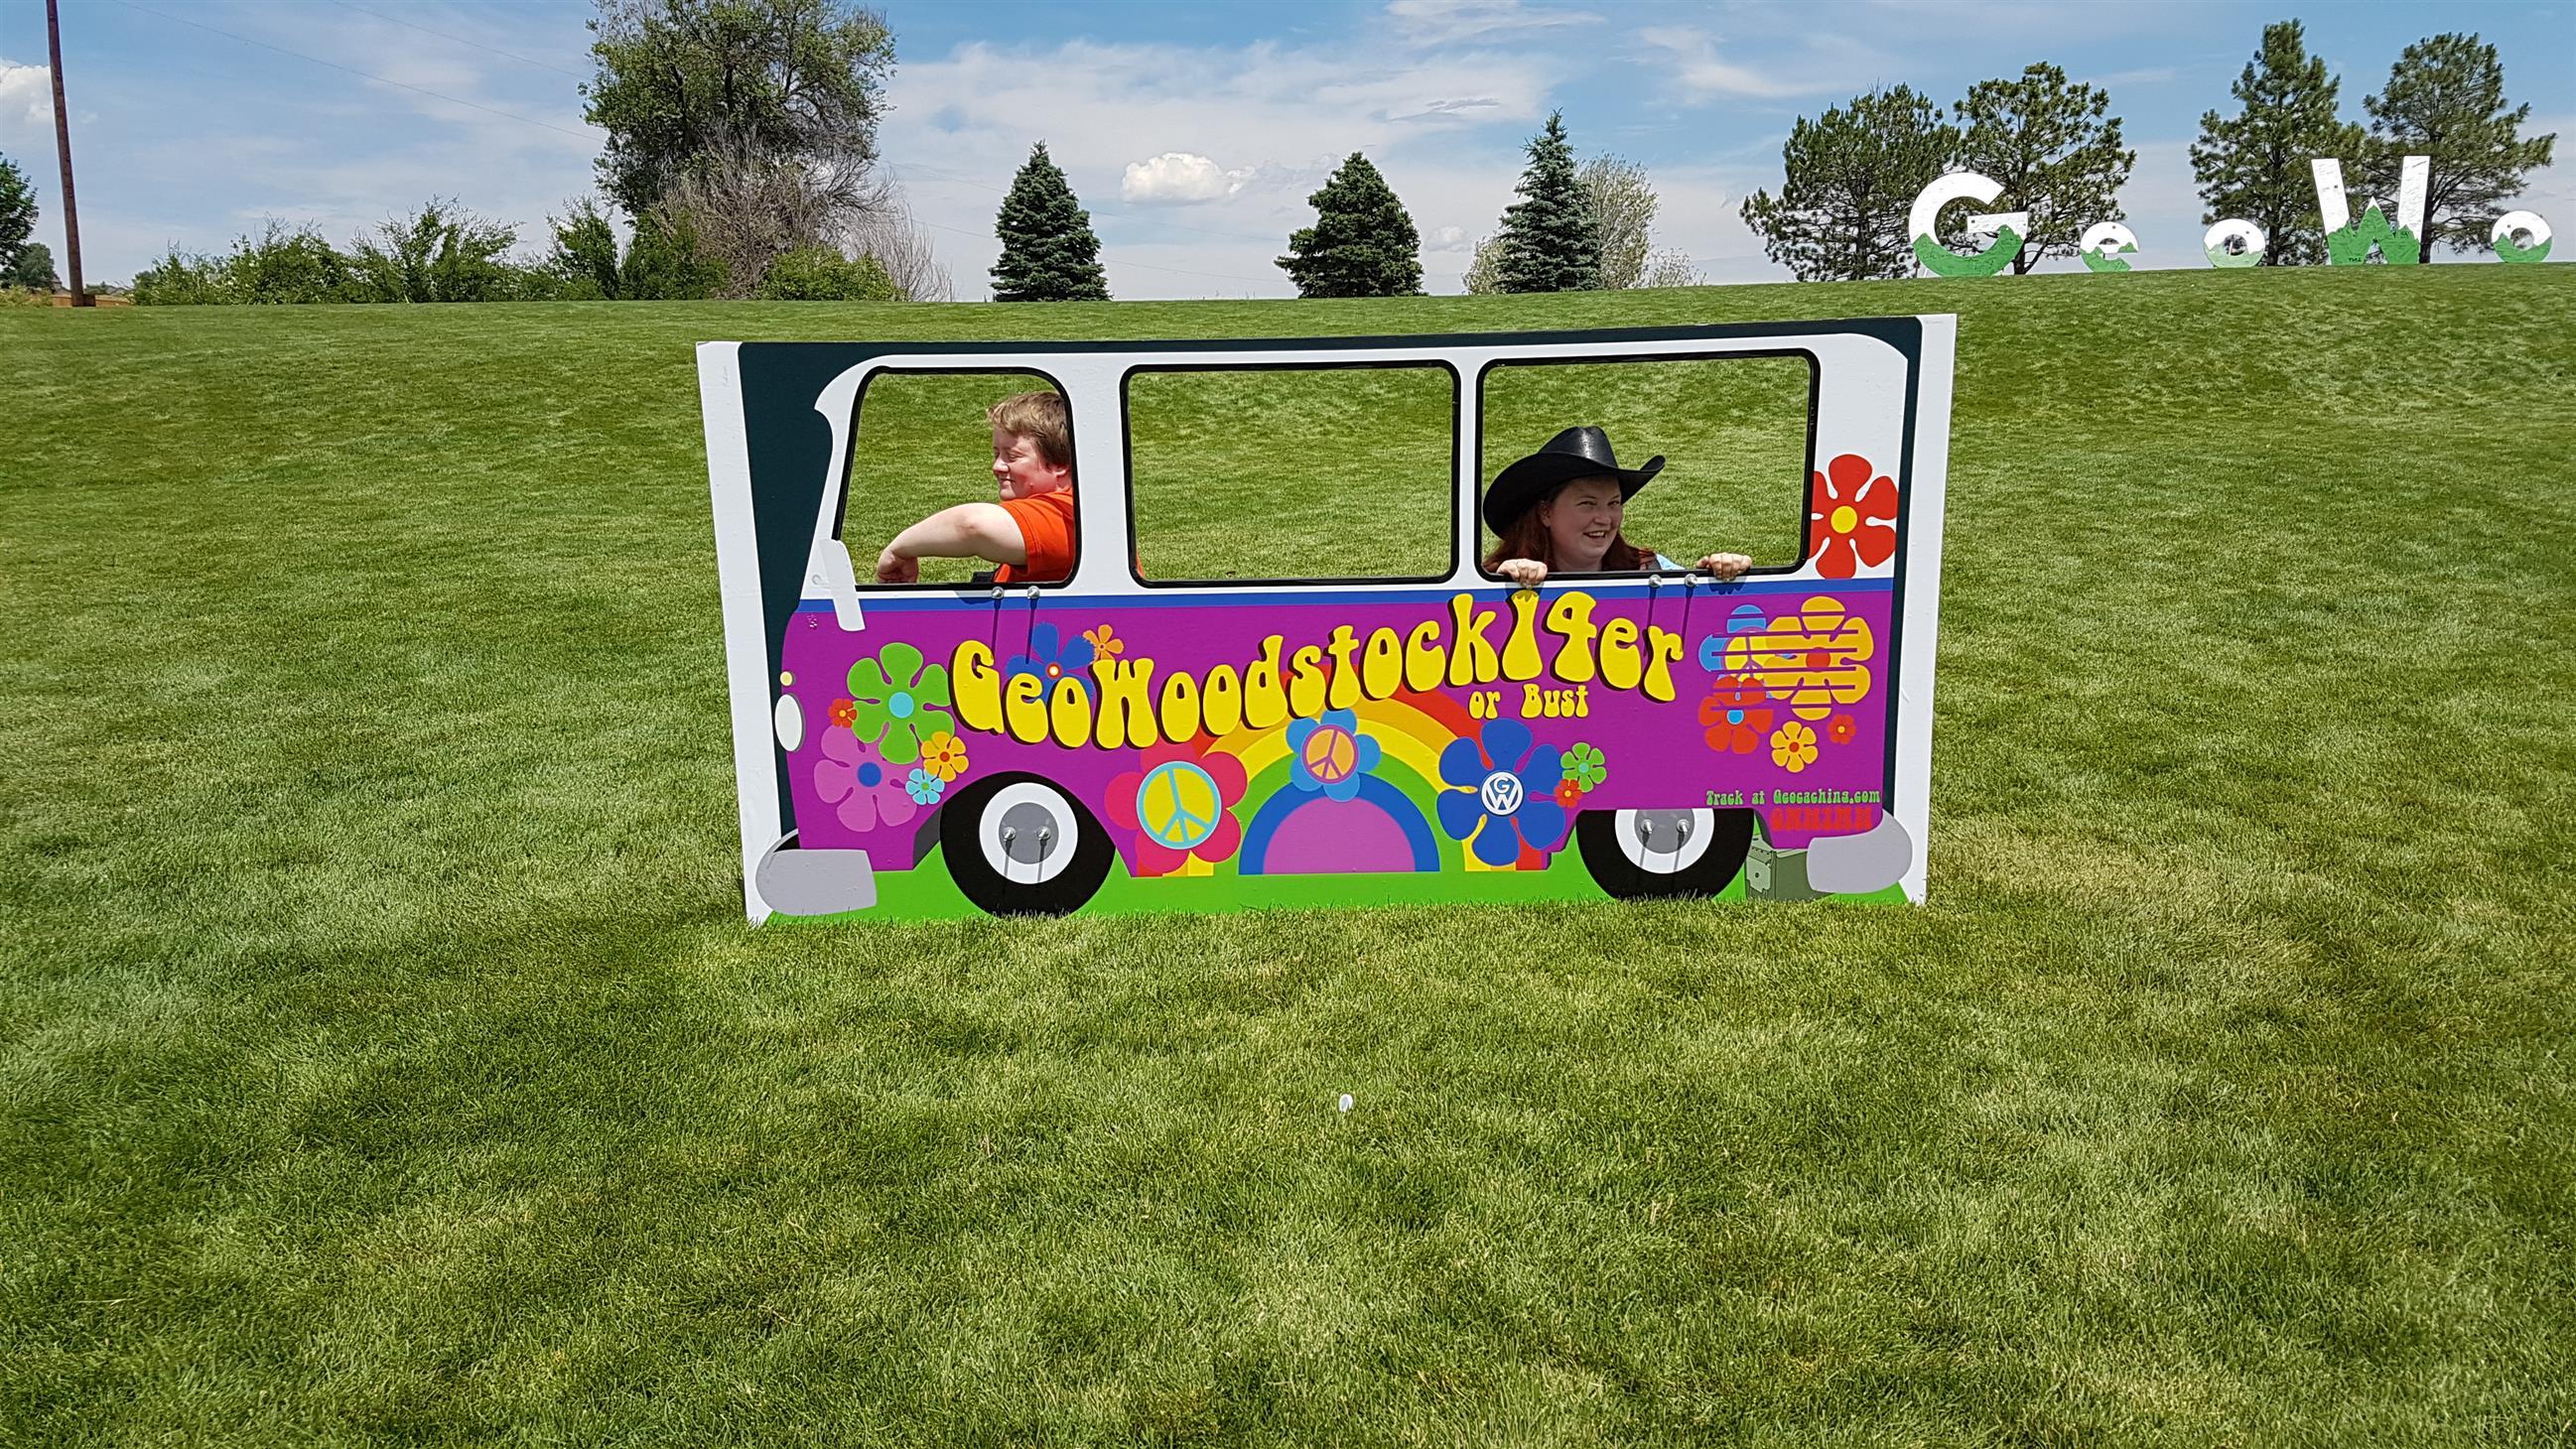 GeoWoodstock bus